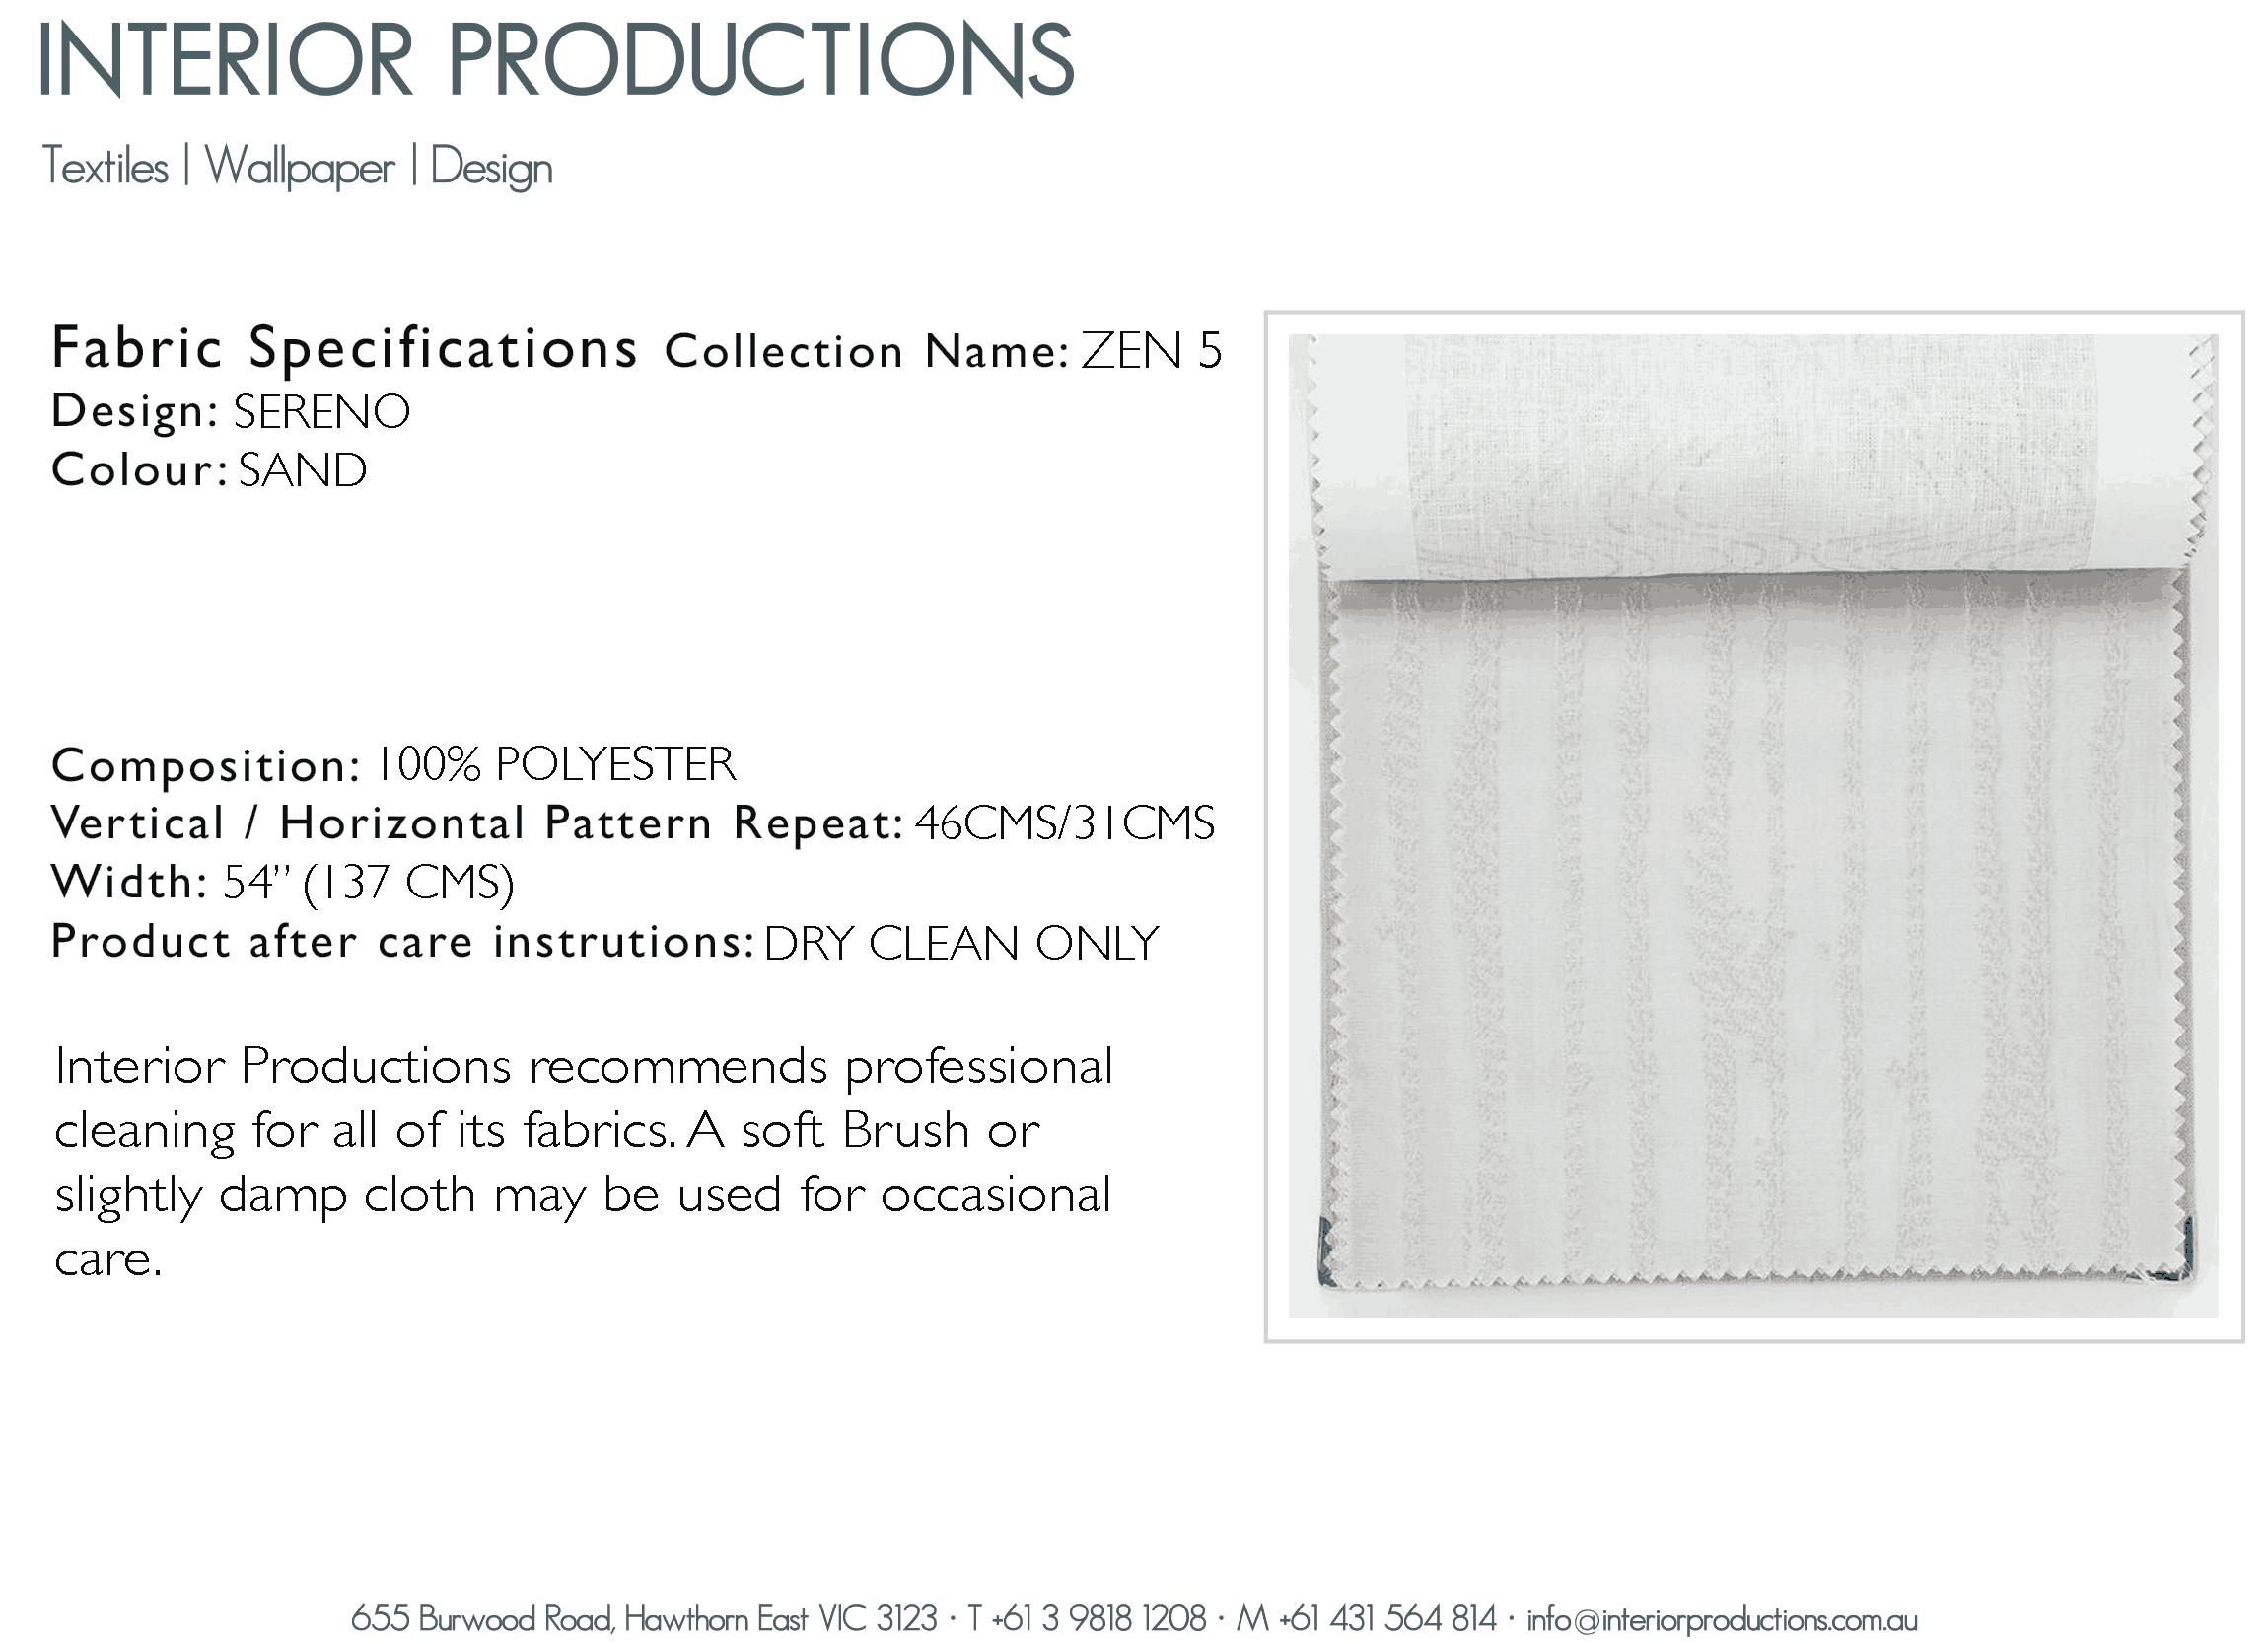 interior_productions_SERENO---SAND